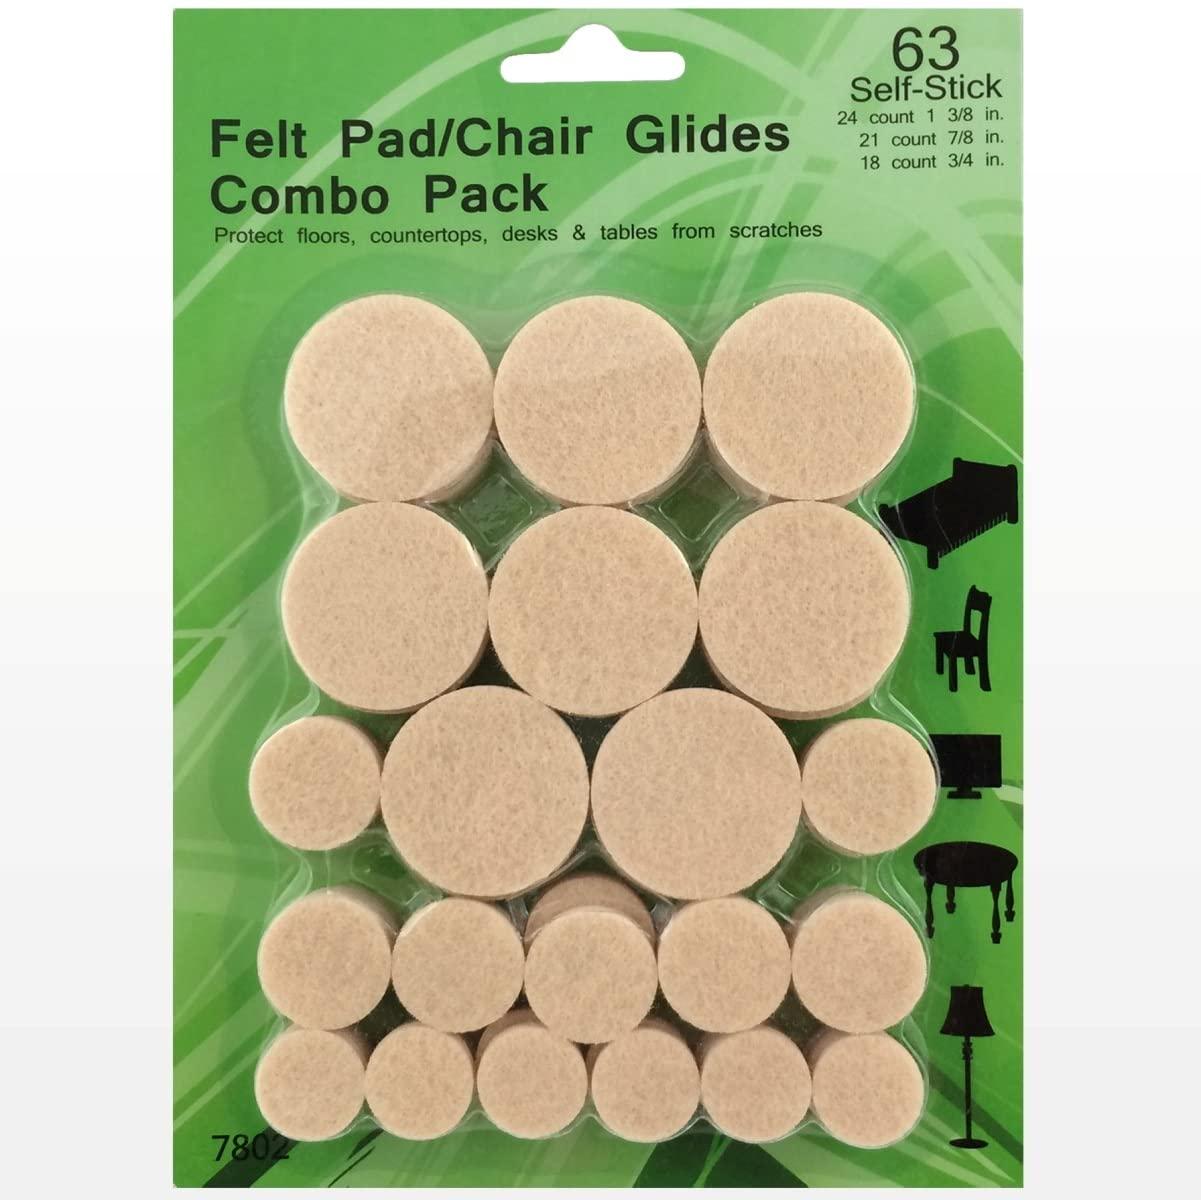 Best Felt Pads - 63 Pack Chair Felt Pads - Self Stick Furniture Glides - Chair Floor Protectors - Floor Scratch Protection - Felt Pads for Hardwood Floors/Laminate/Linoleum/Tile Sliders - Guarantee.